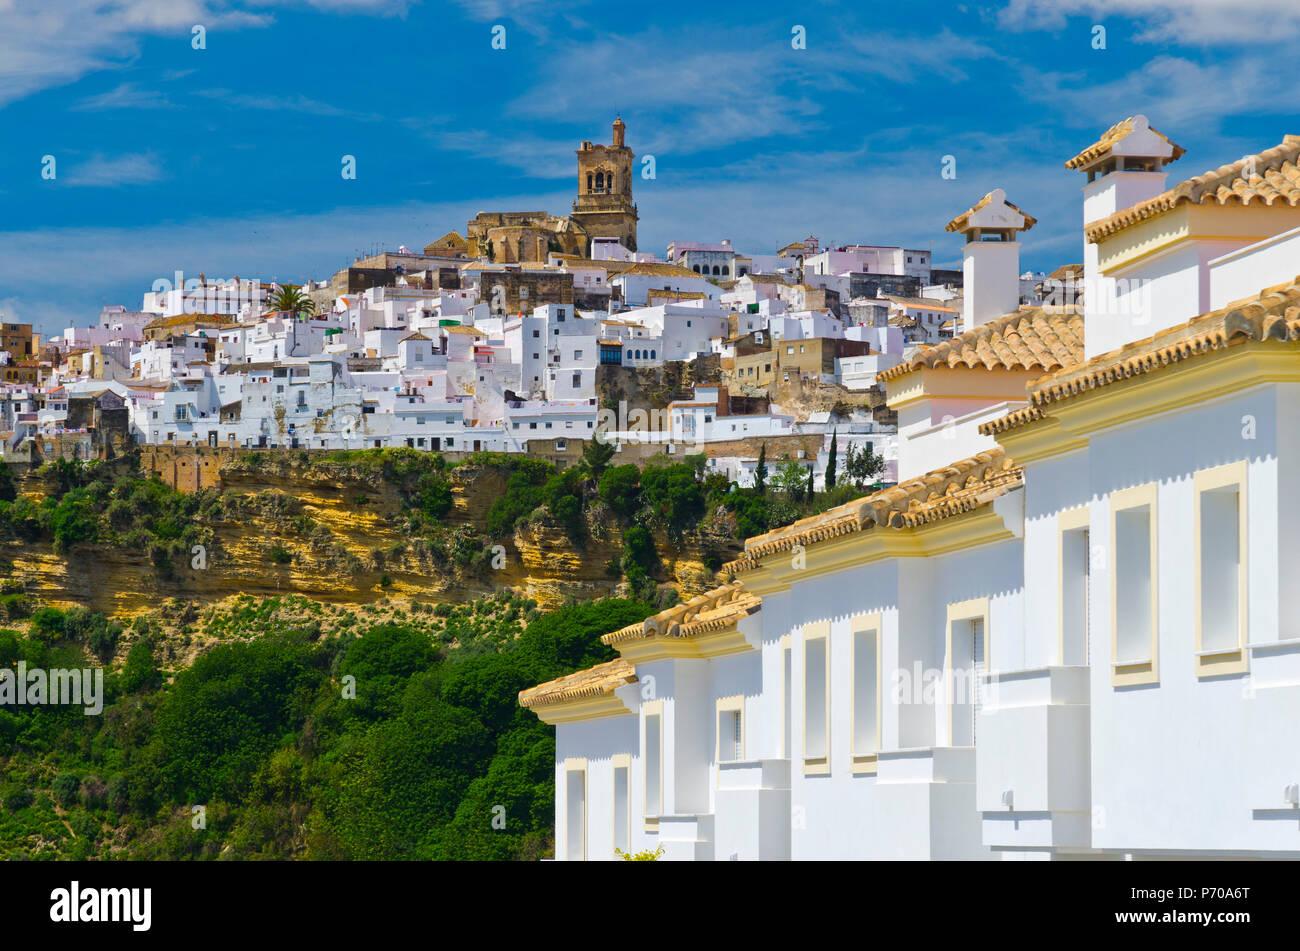 Spain, Andalucia, Cadiz Province, Arcos de la Frontera, a Pueblo Blanco, White Village - Stock Image